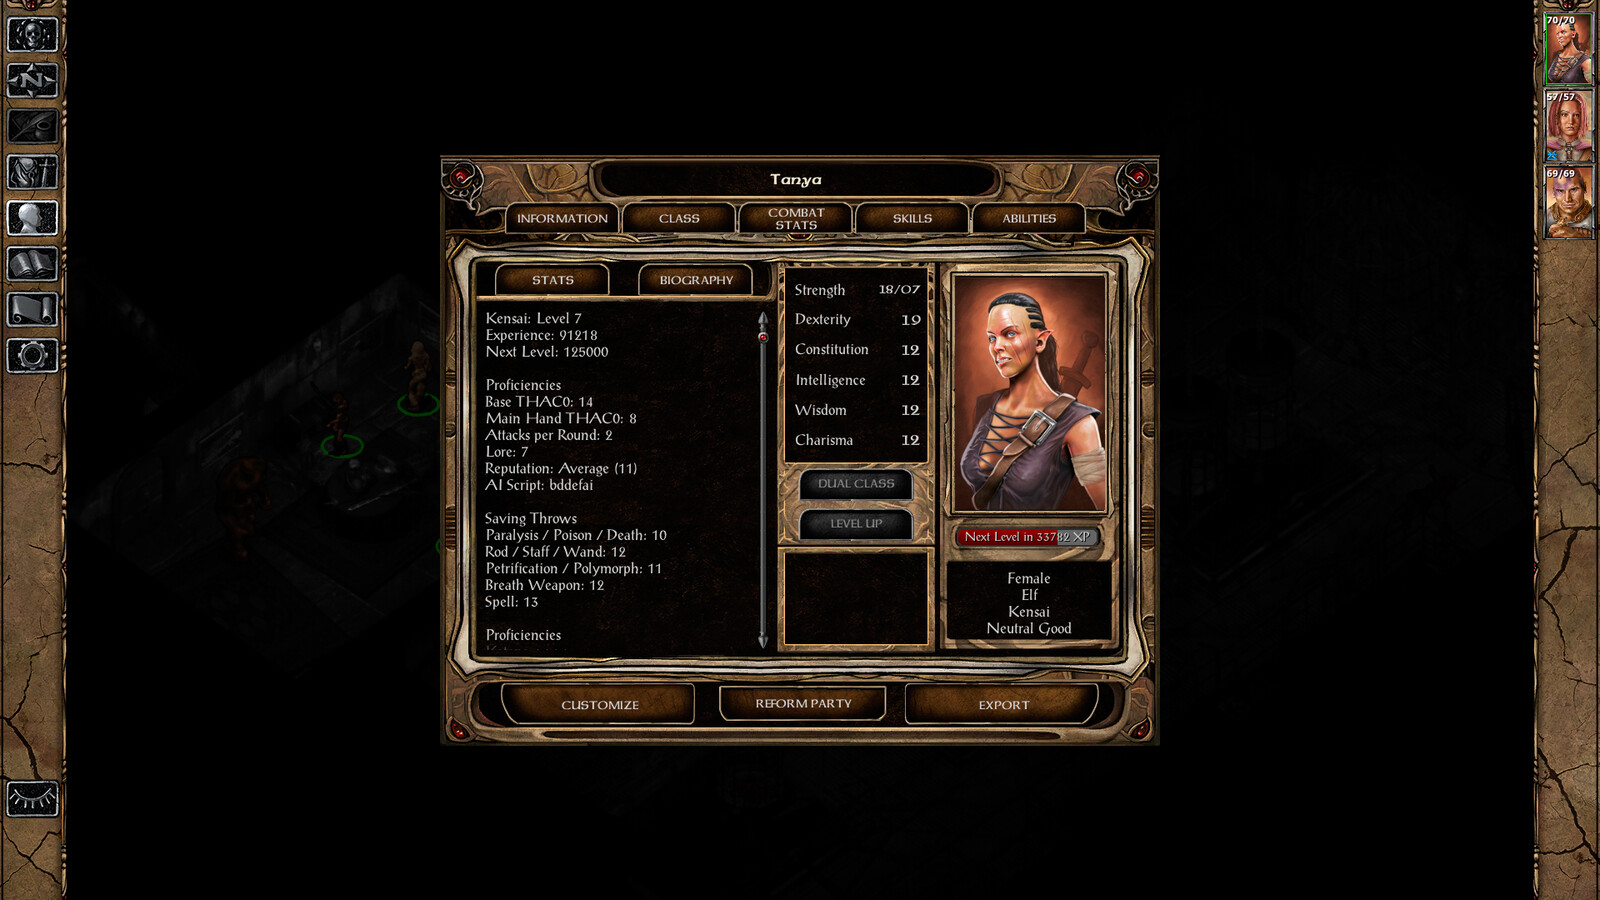 In game screen shot from Baldur's Gate 2.